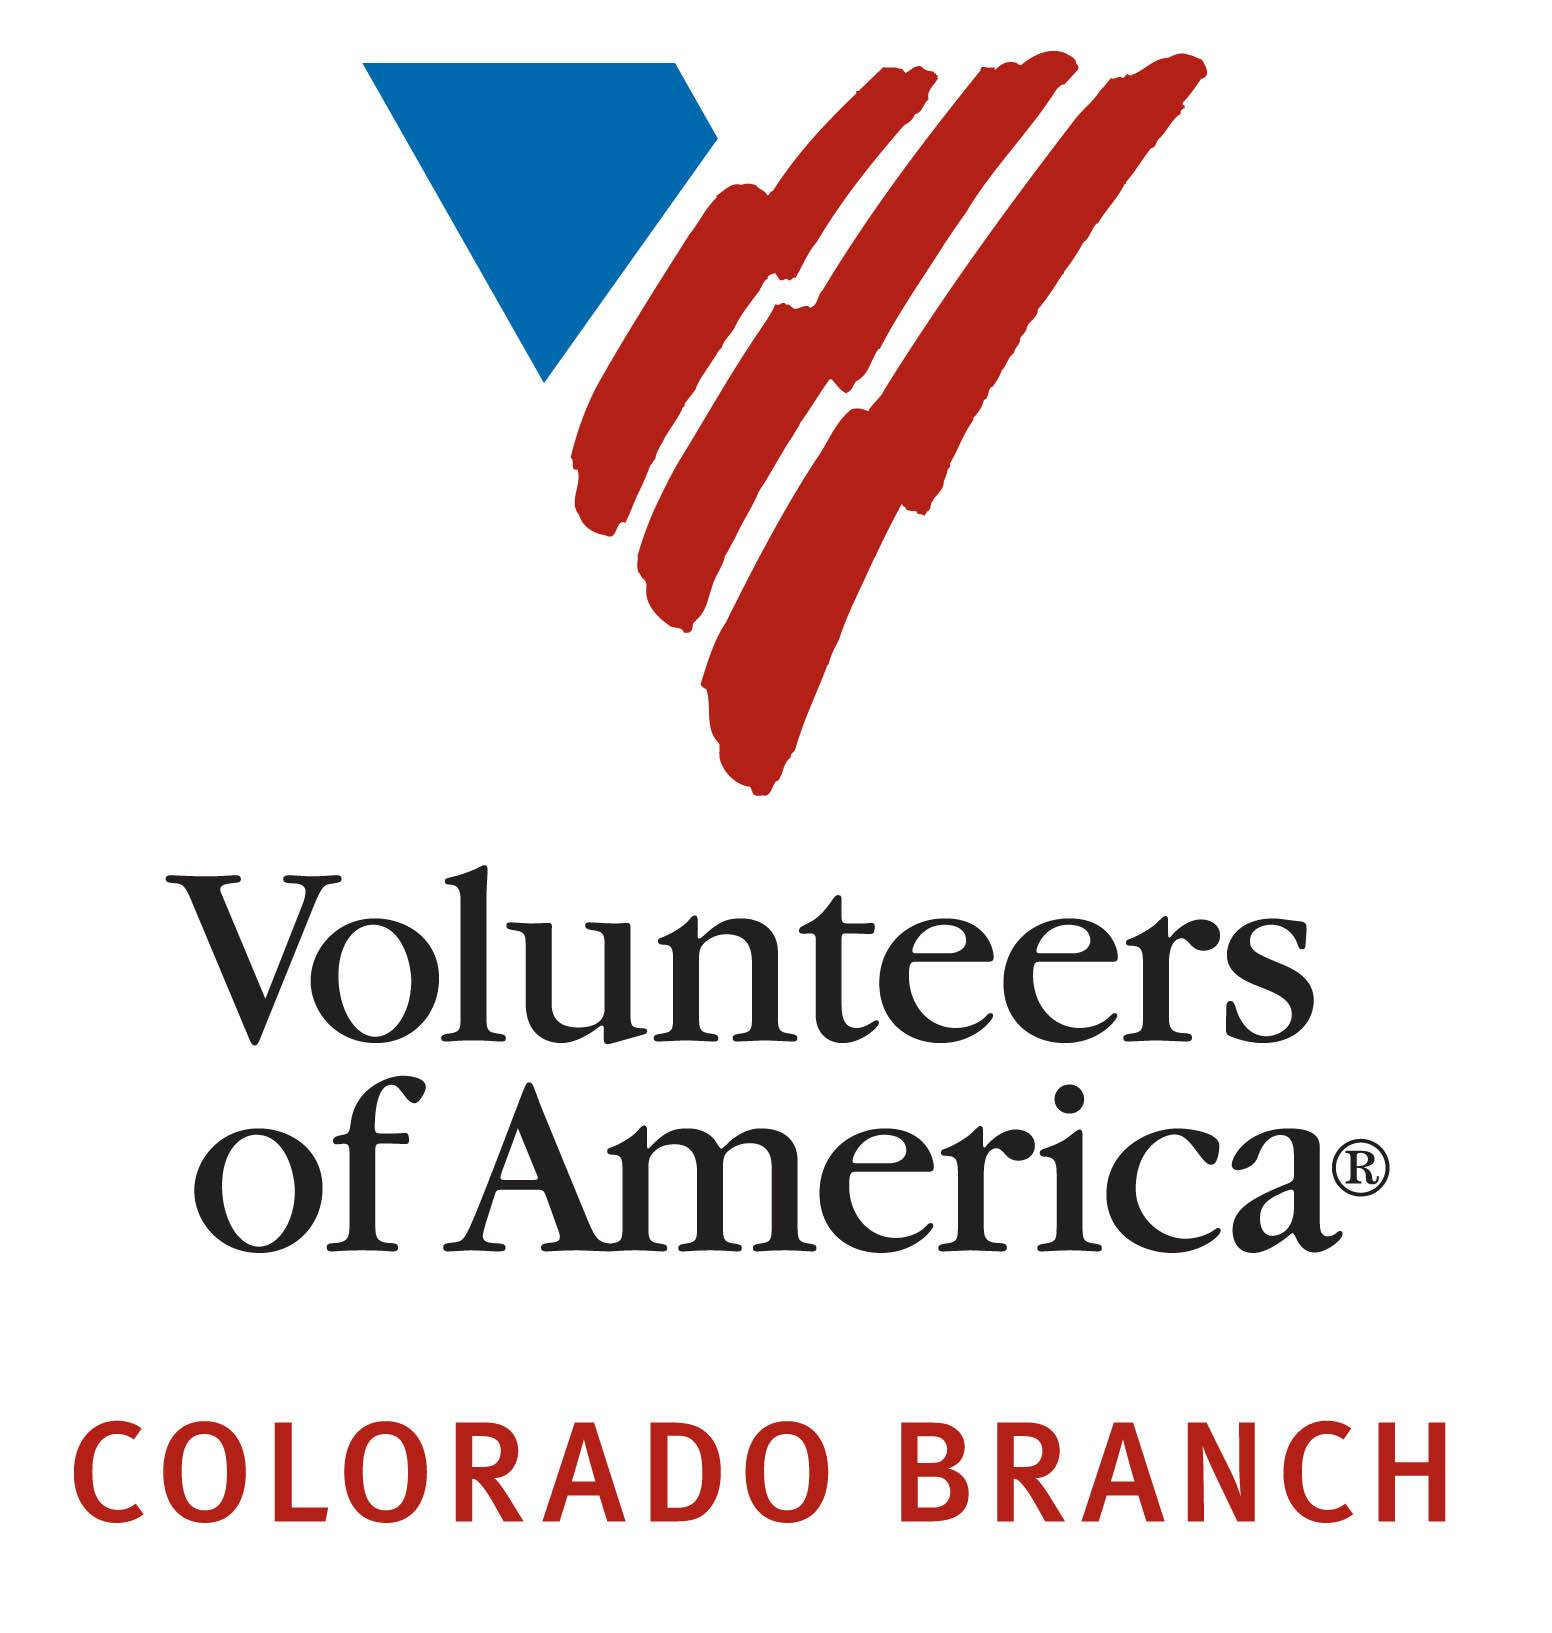 Volunteers Of America, Inc. Dba Volunteers Of America Colorado Branch